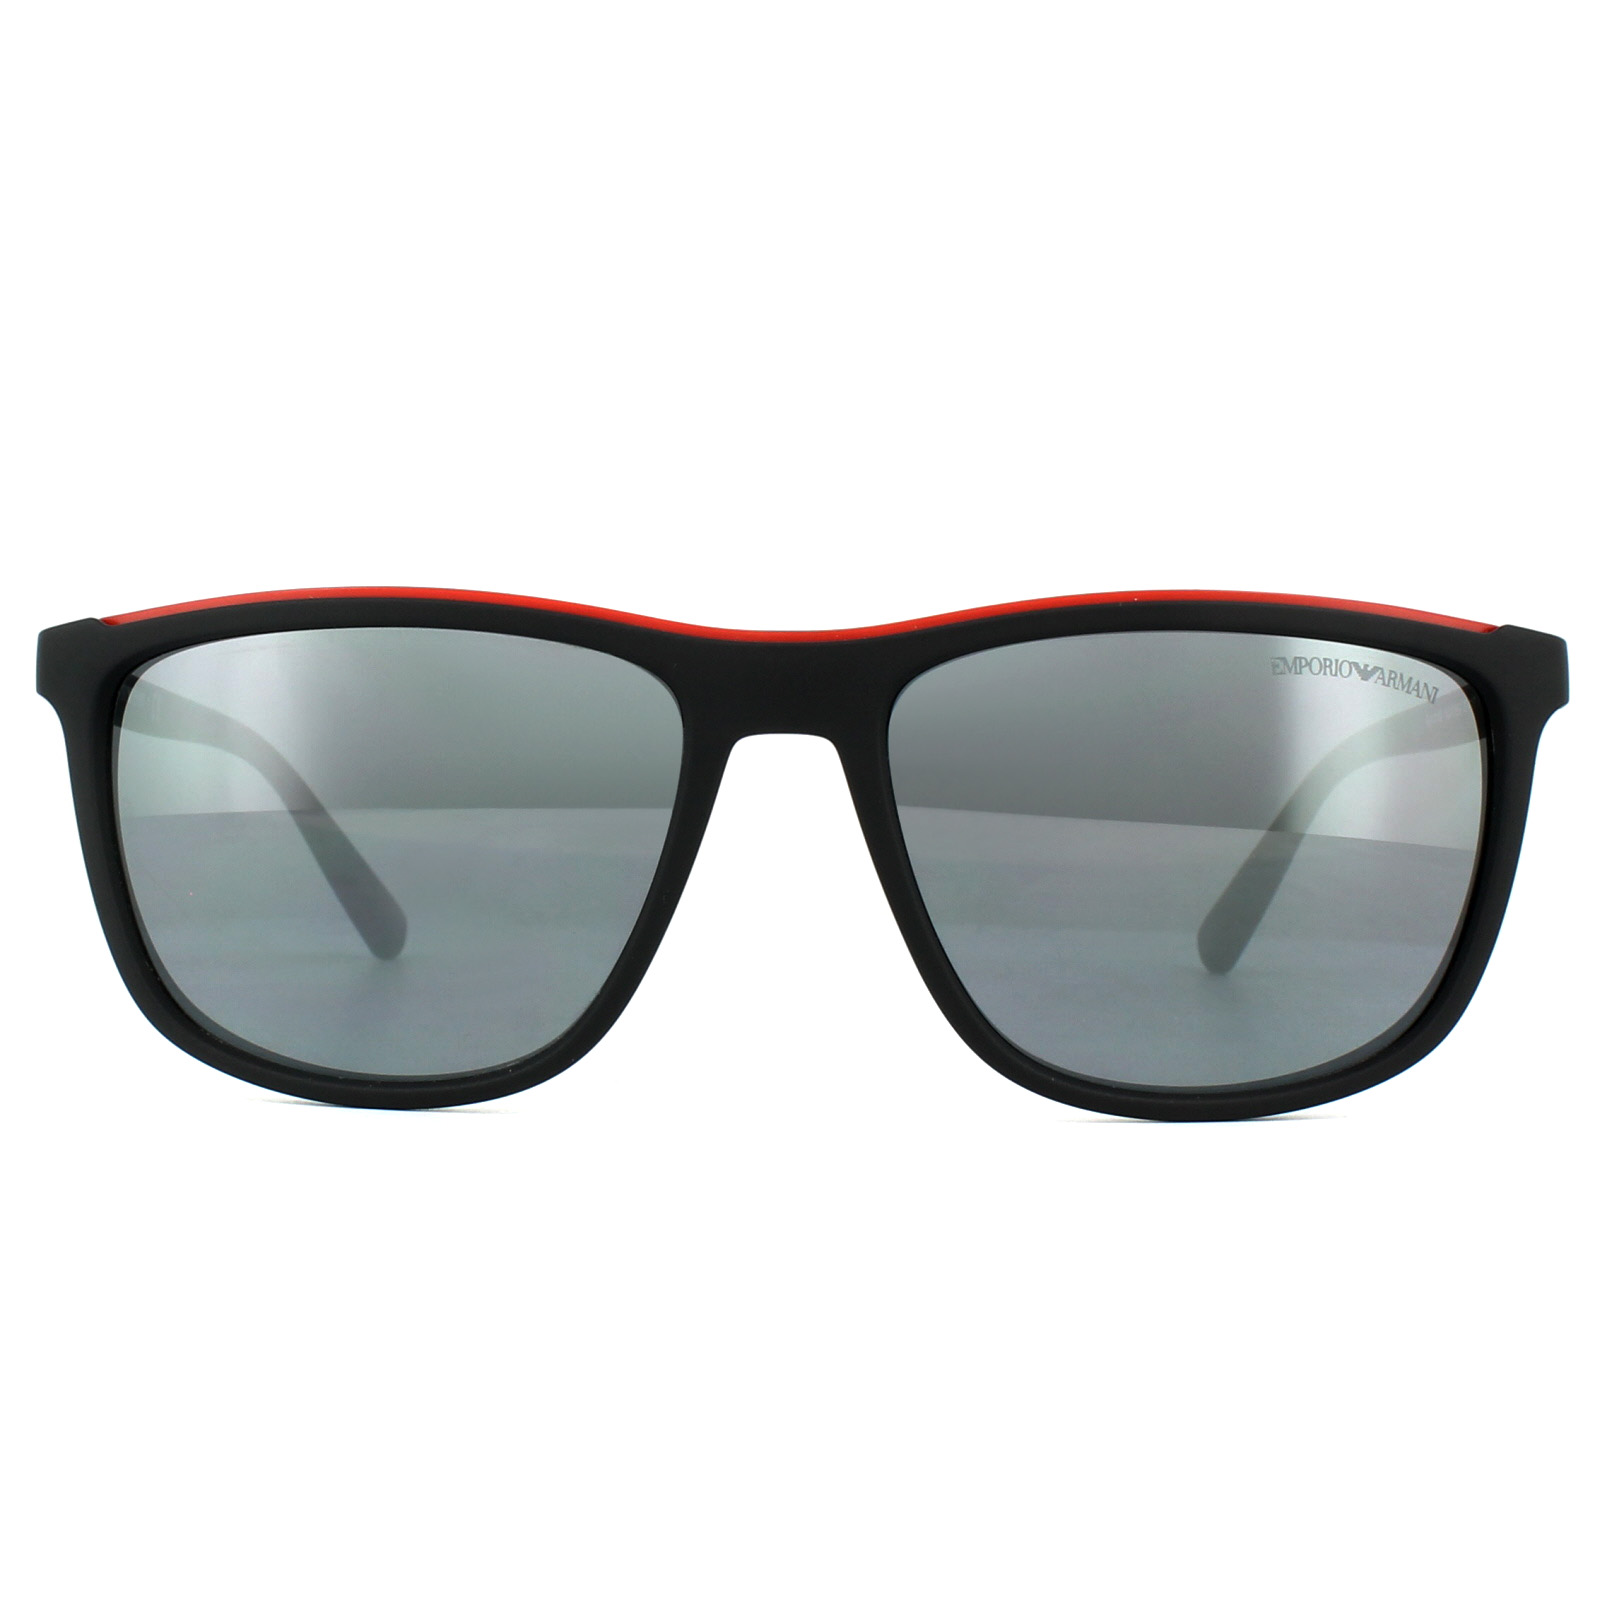 Sentinel Emporio Armani Sunglasses EA4109 50426G Matt Black Light Grey  Mirror Black b8dc0a79fe